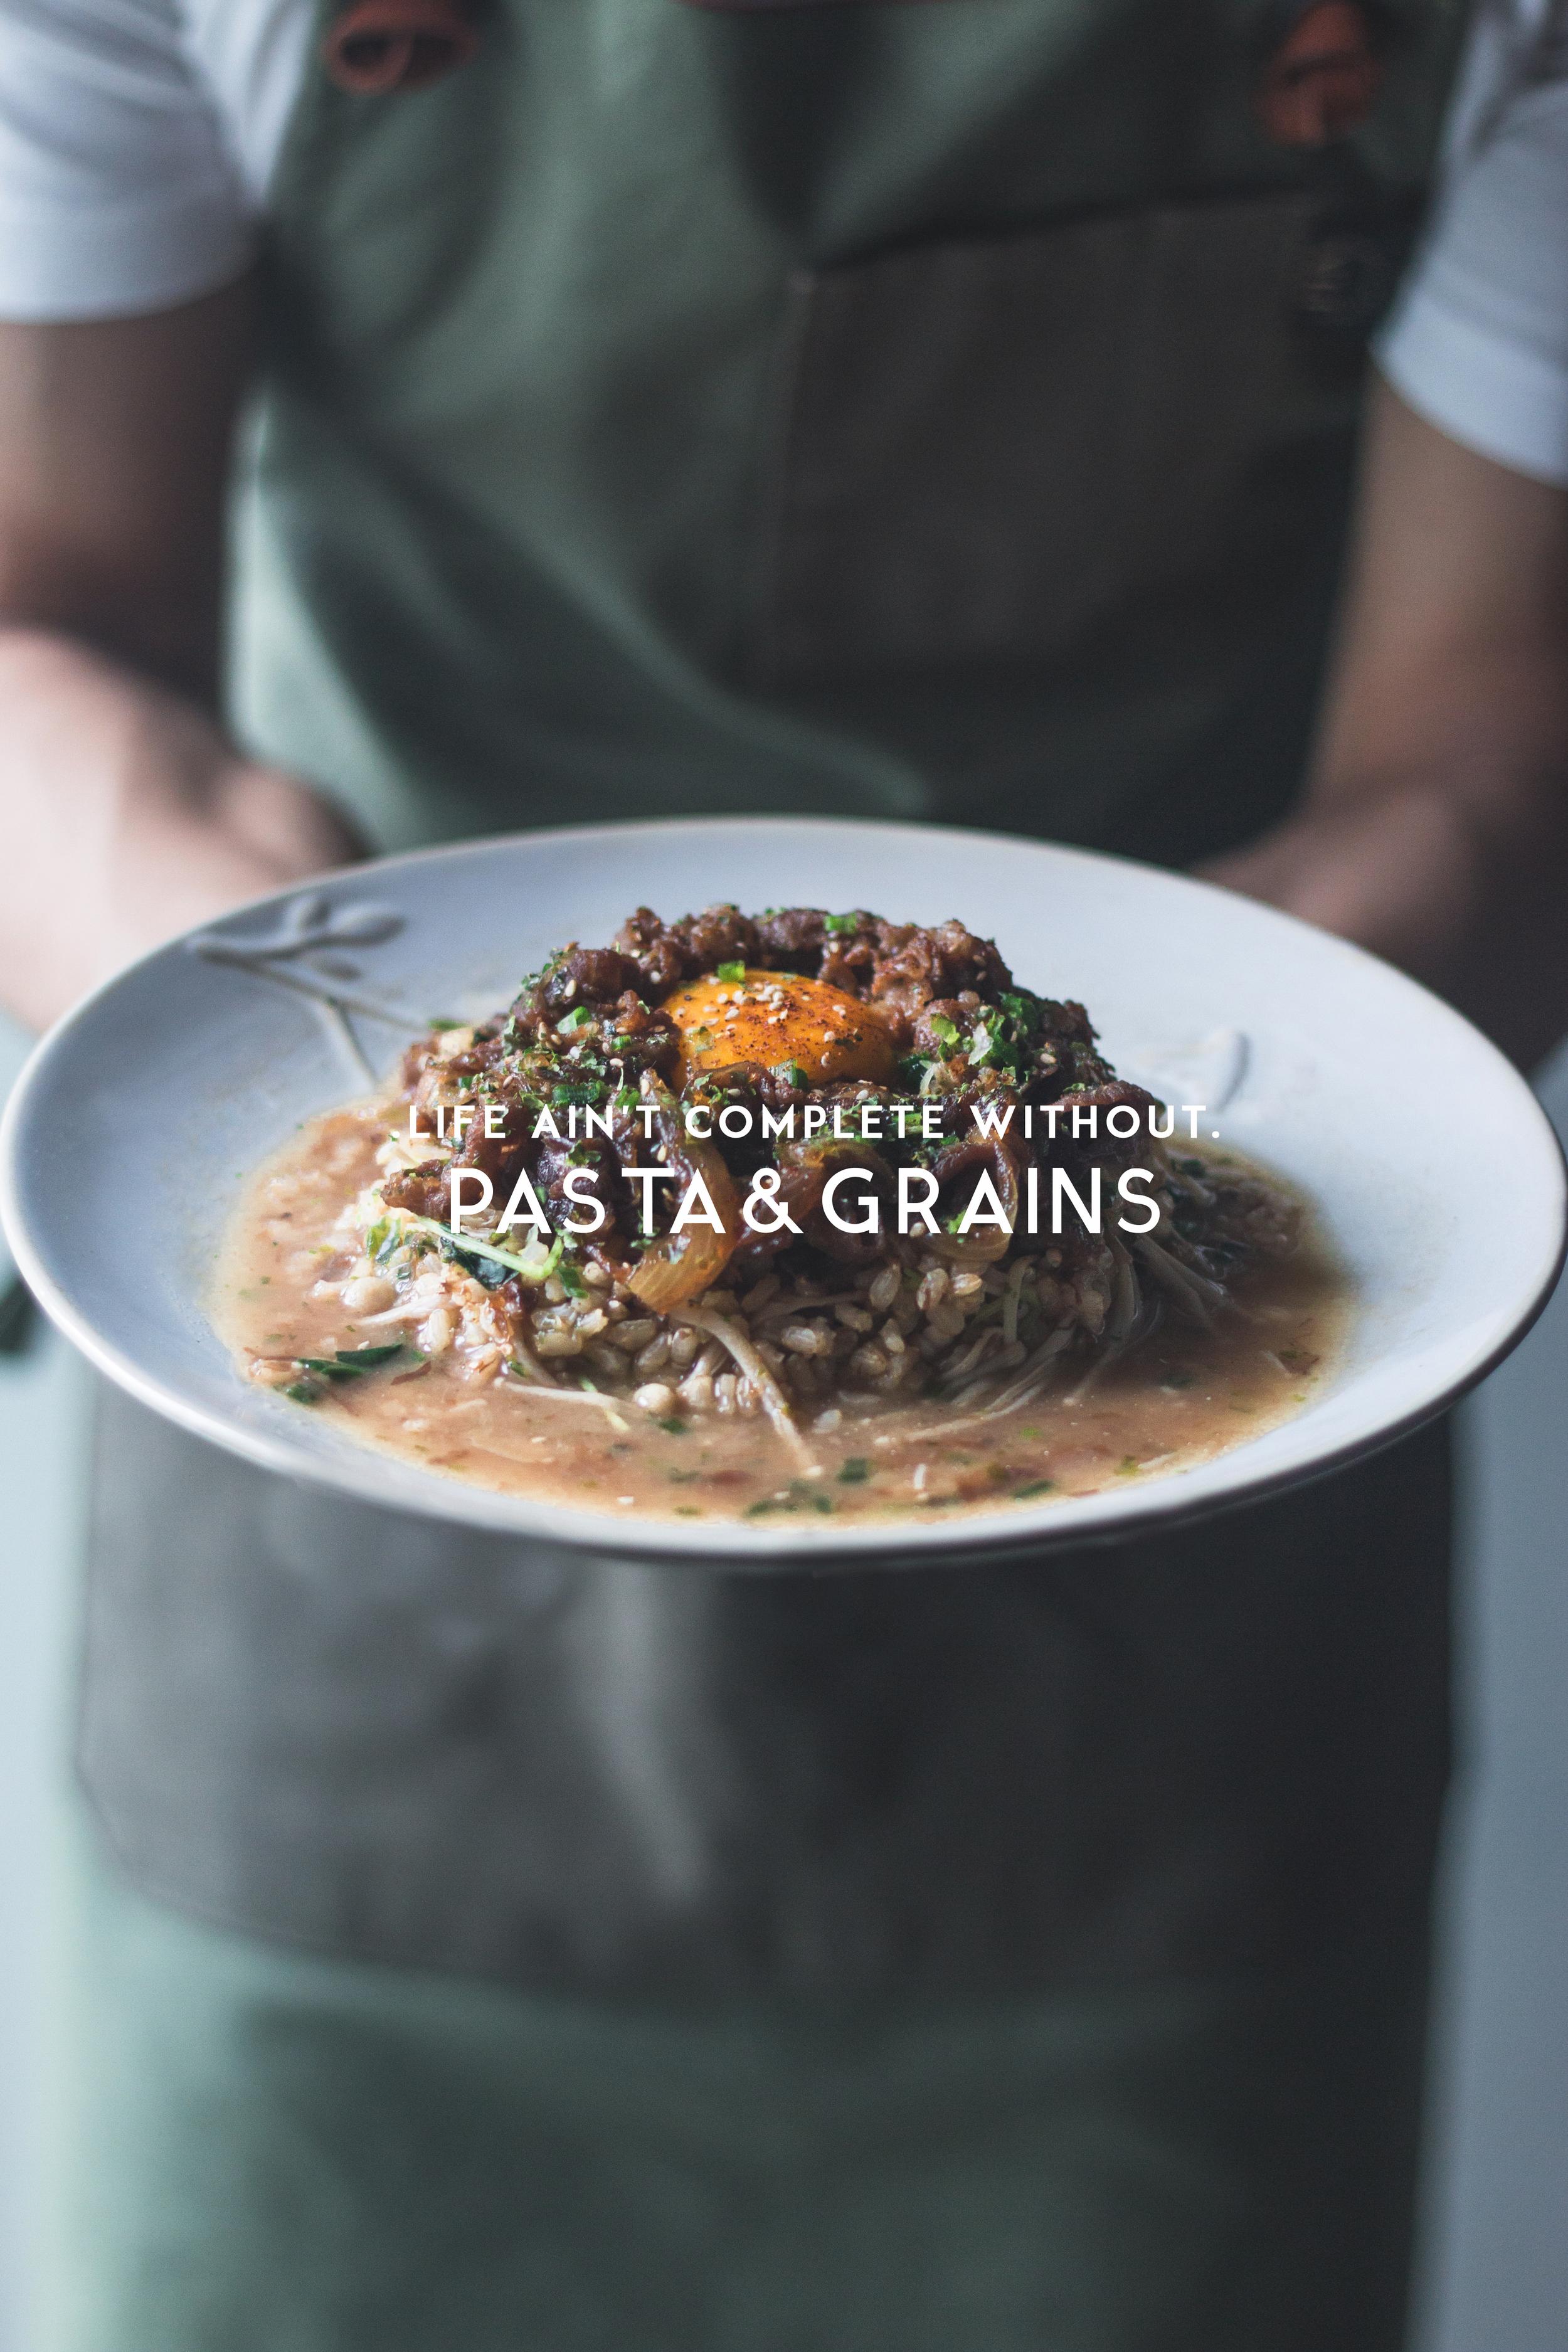 pasta&grains.jpg